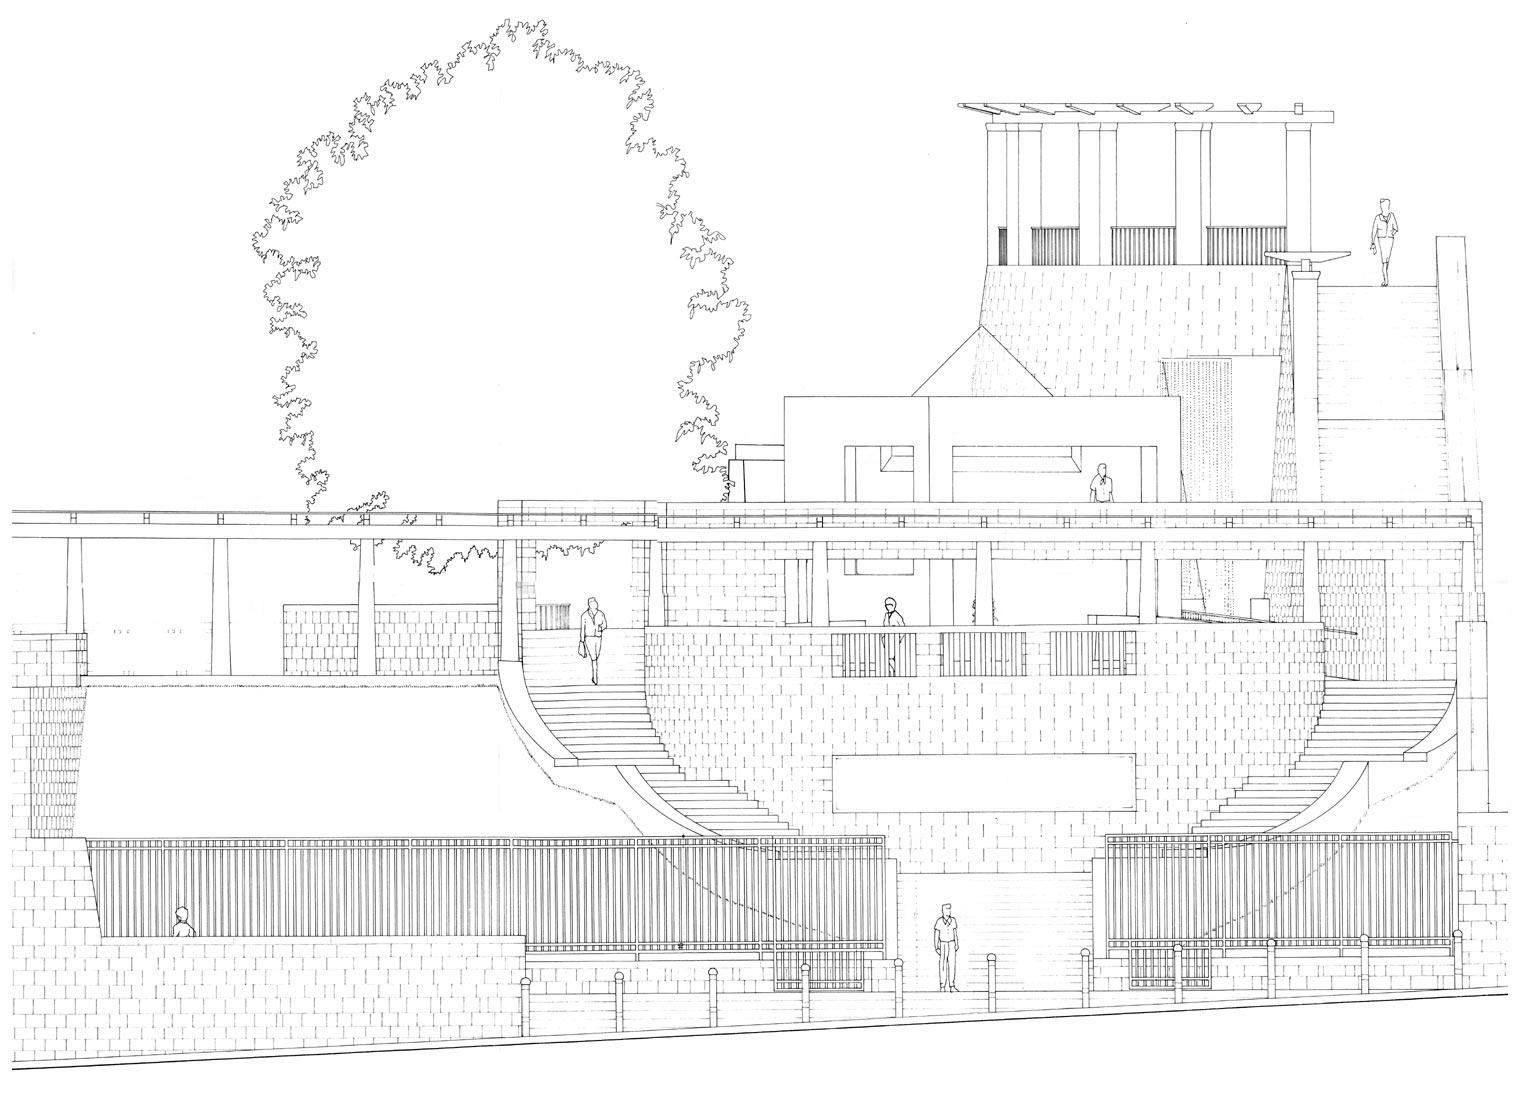 vk-architetti_sanmichele_prosp2